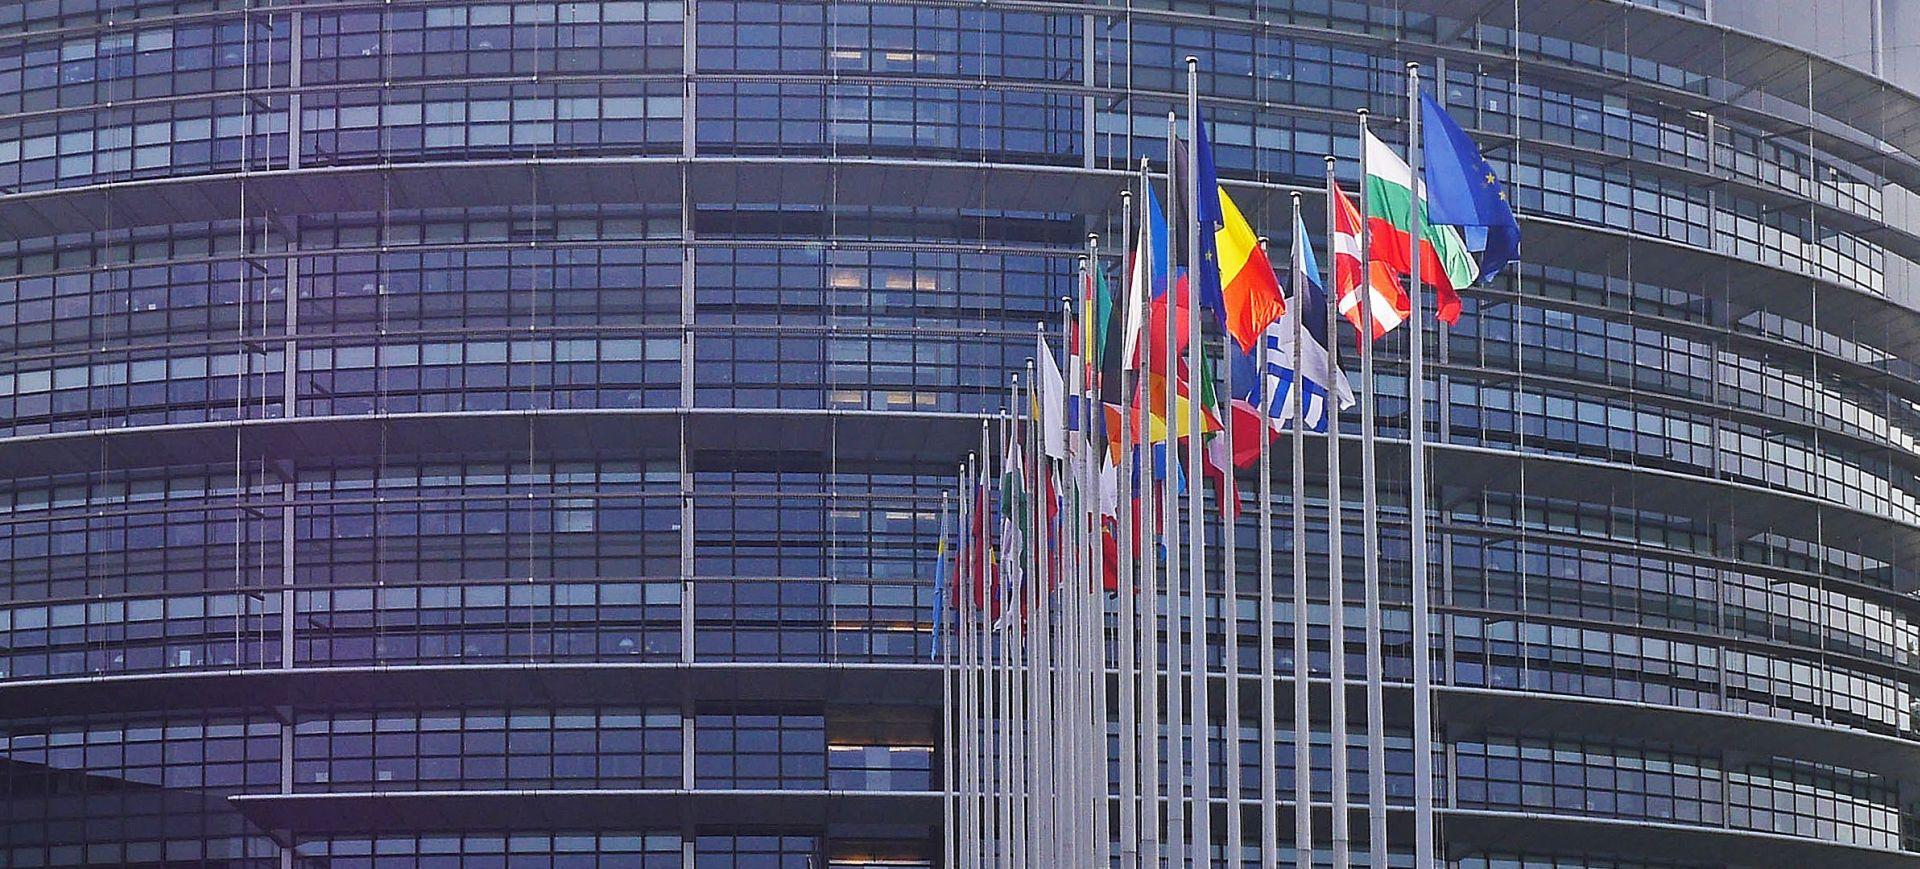 Propagandni materijal IS-a pronađen kod vozača Europskog parlamenta